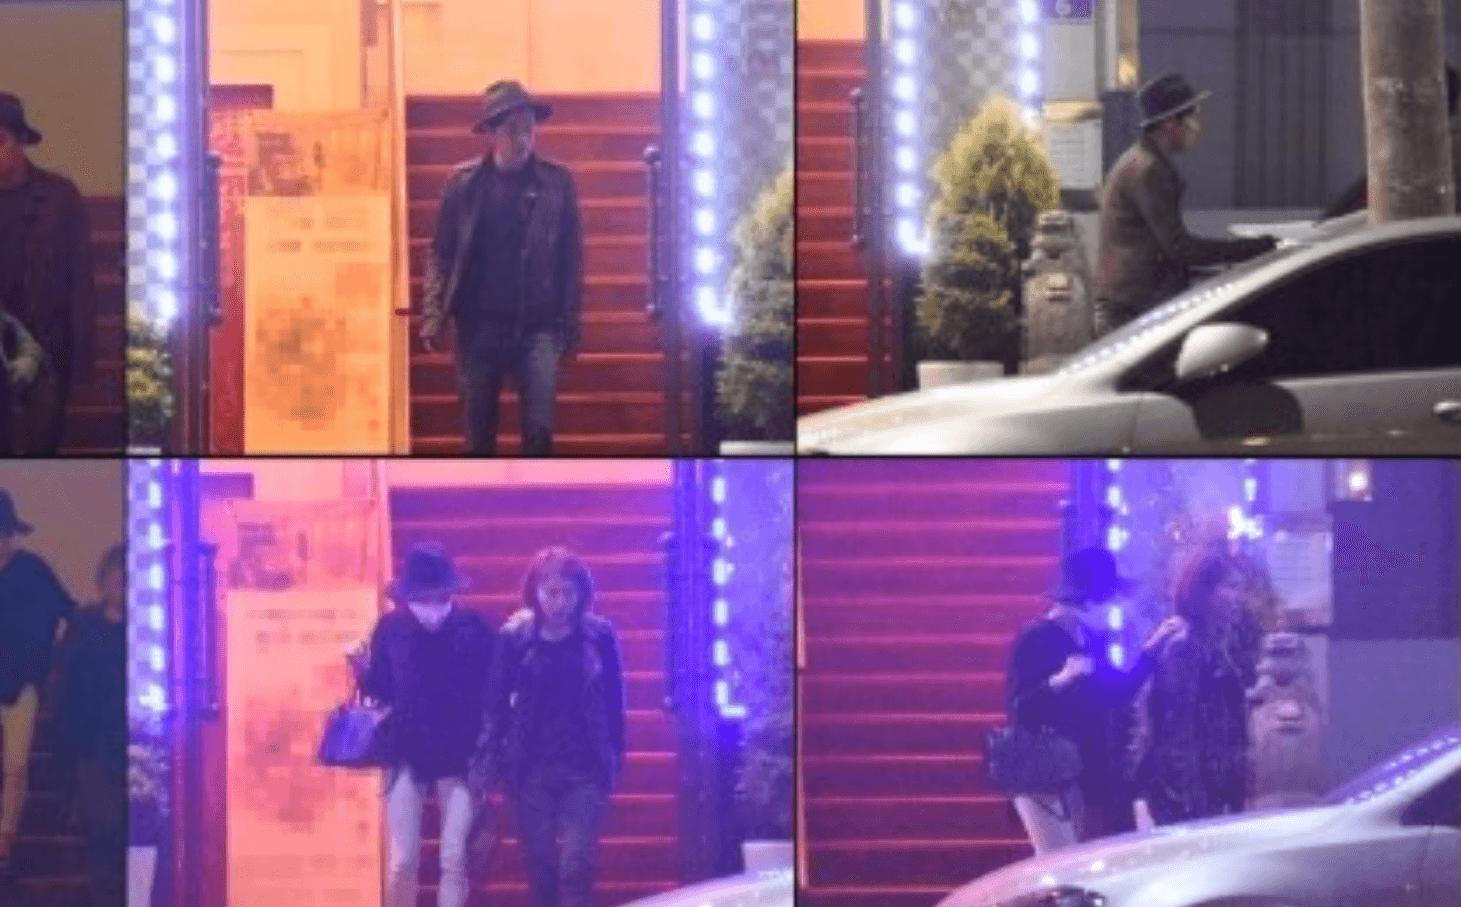 baekhyun and taeyeon dating 2015